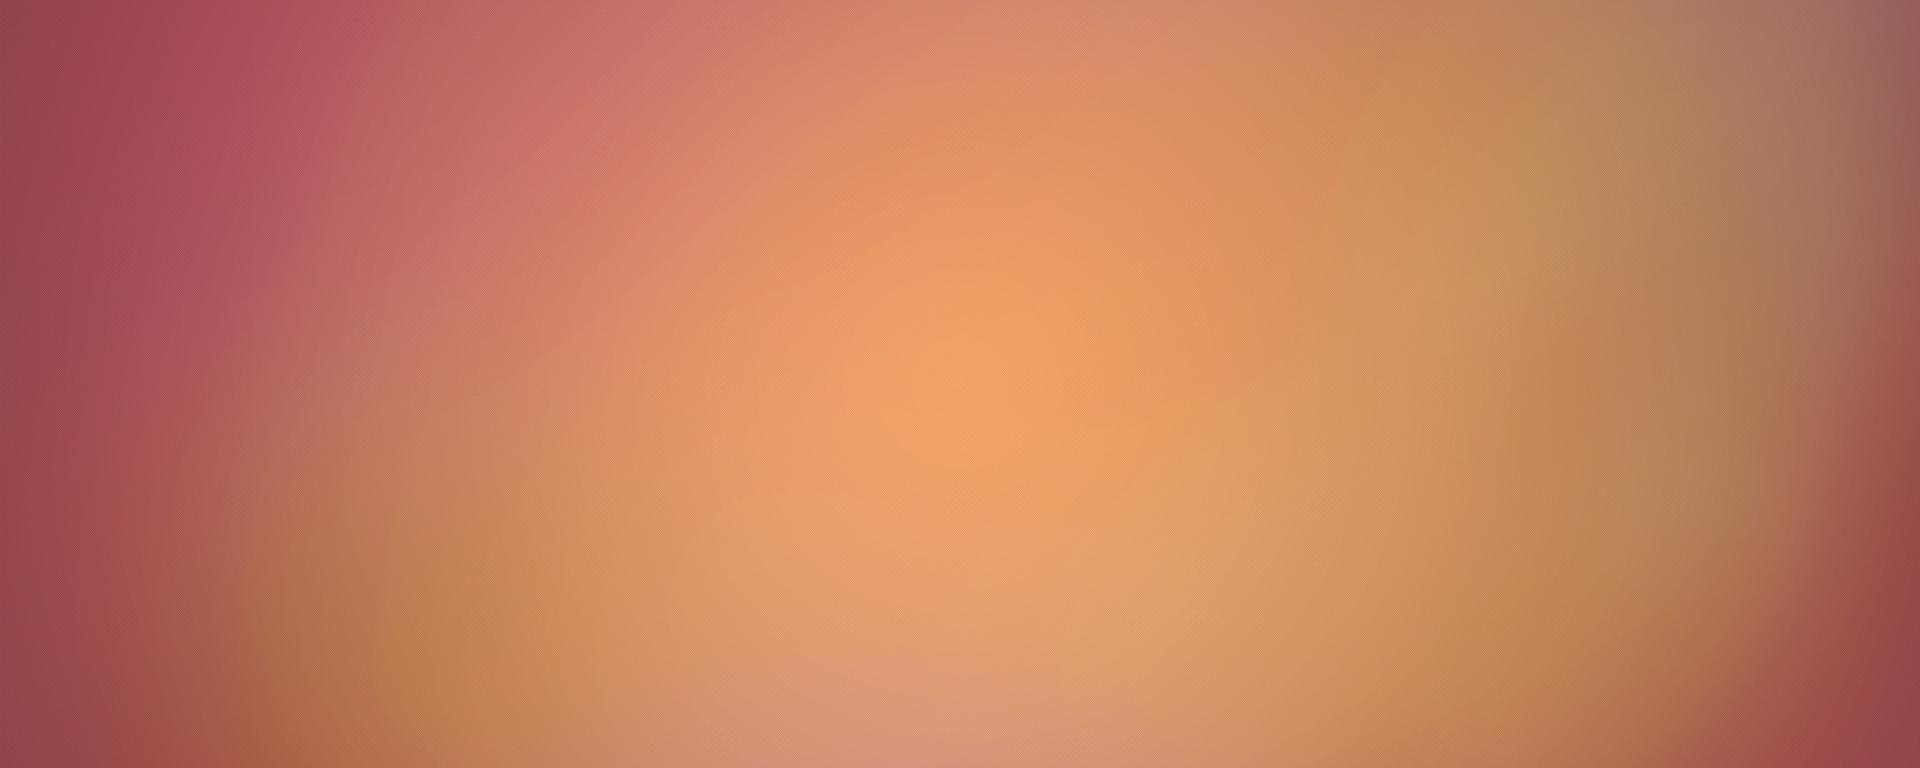 Pale Orange